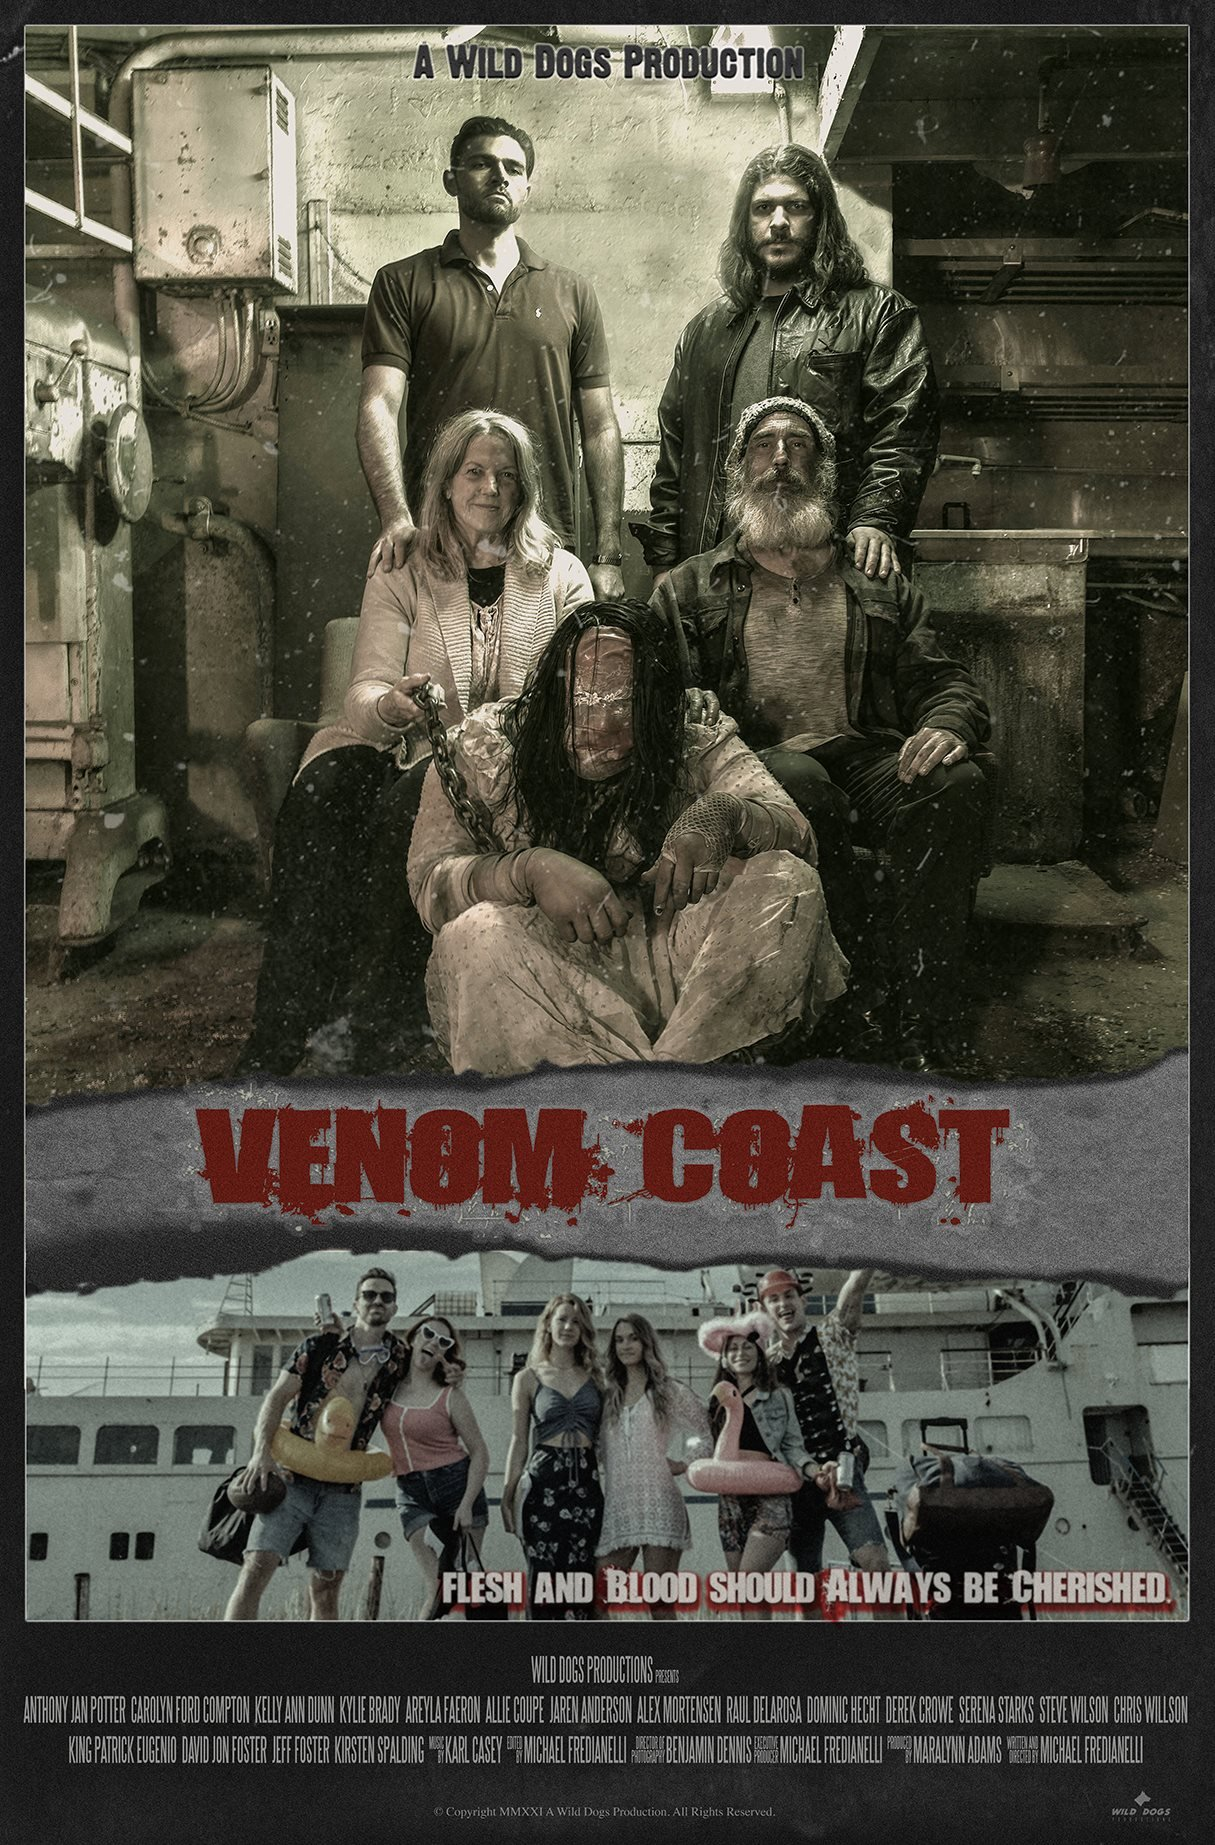 Venom Coast poster image